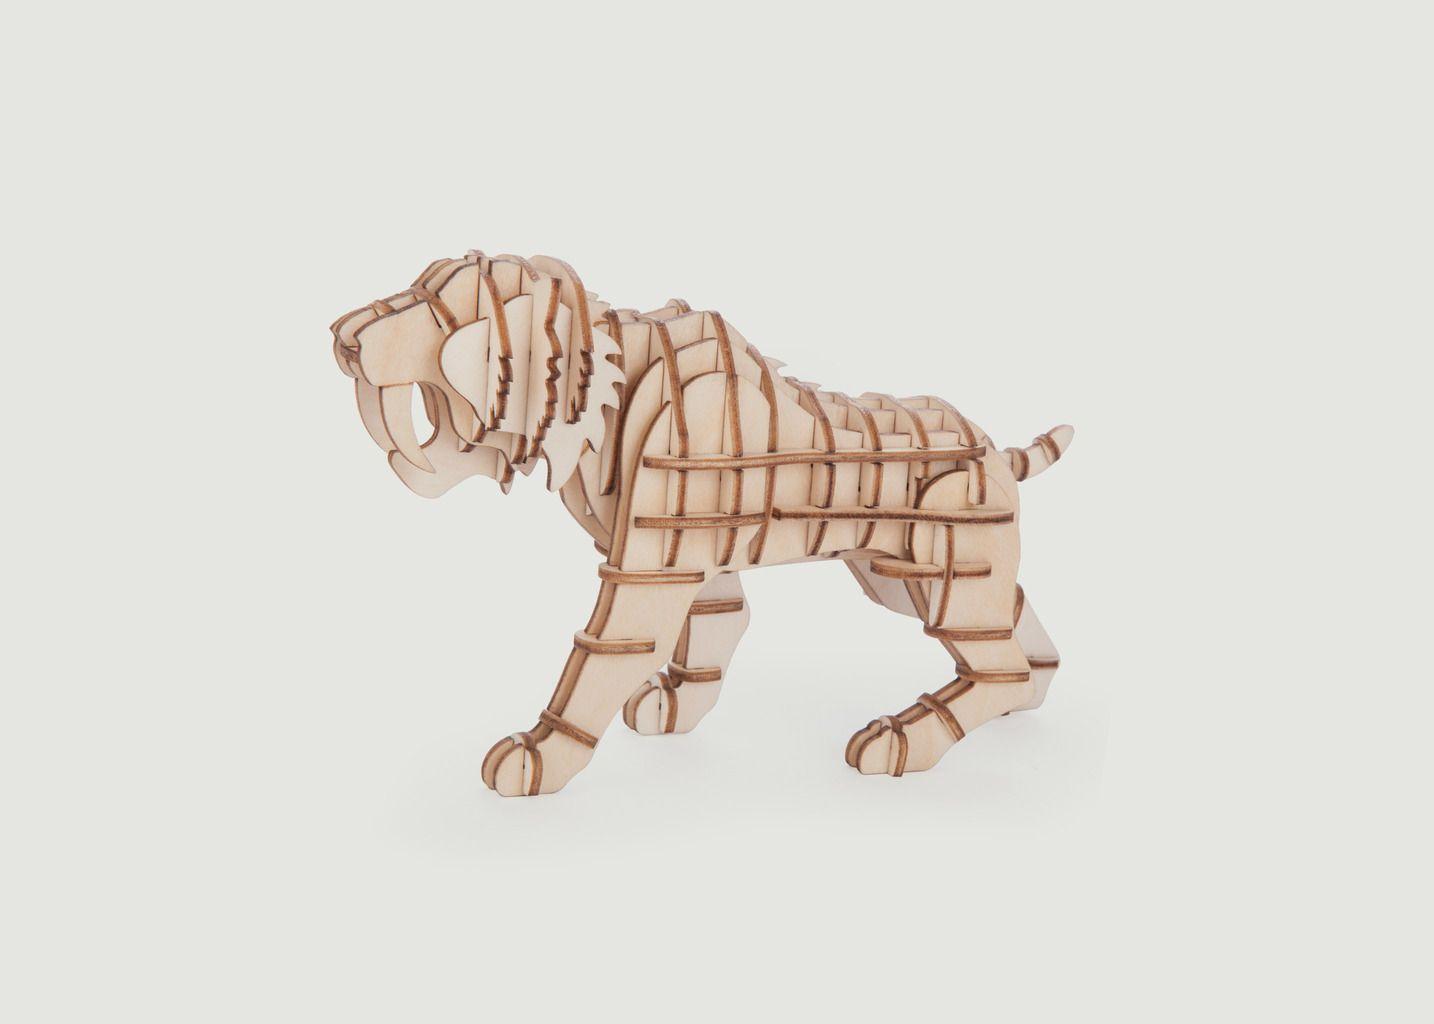 Puzzle 3D en Bois, 'Tigre' - Kikkerland